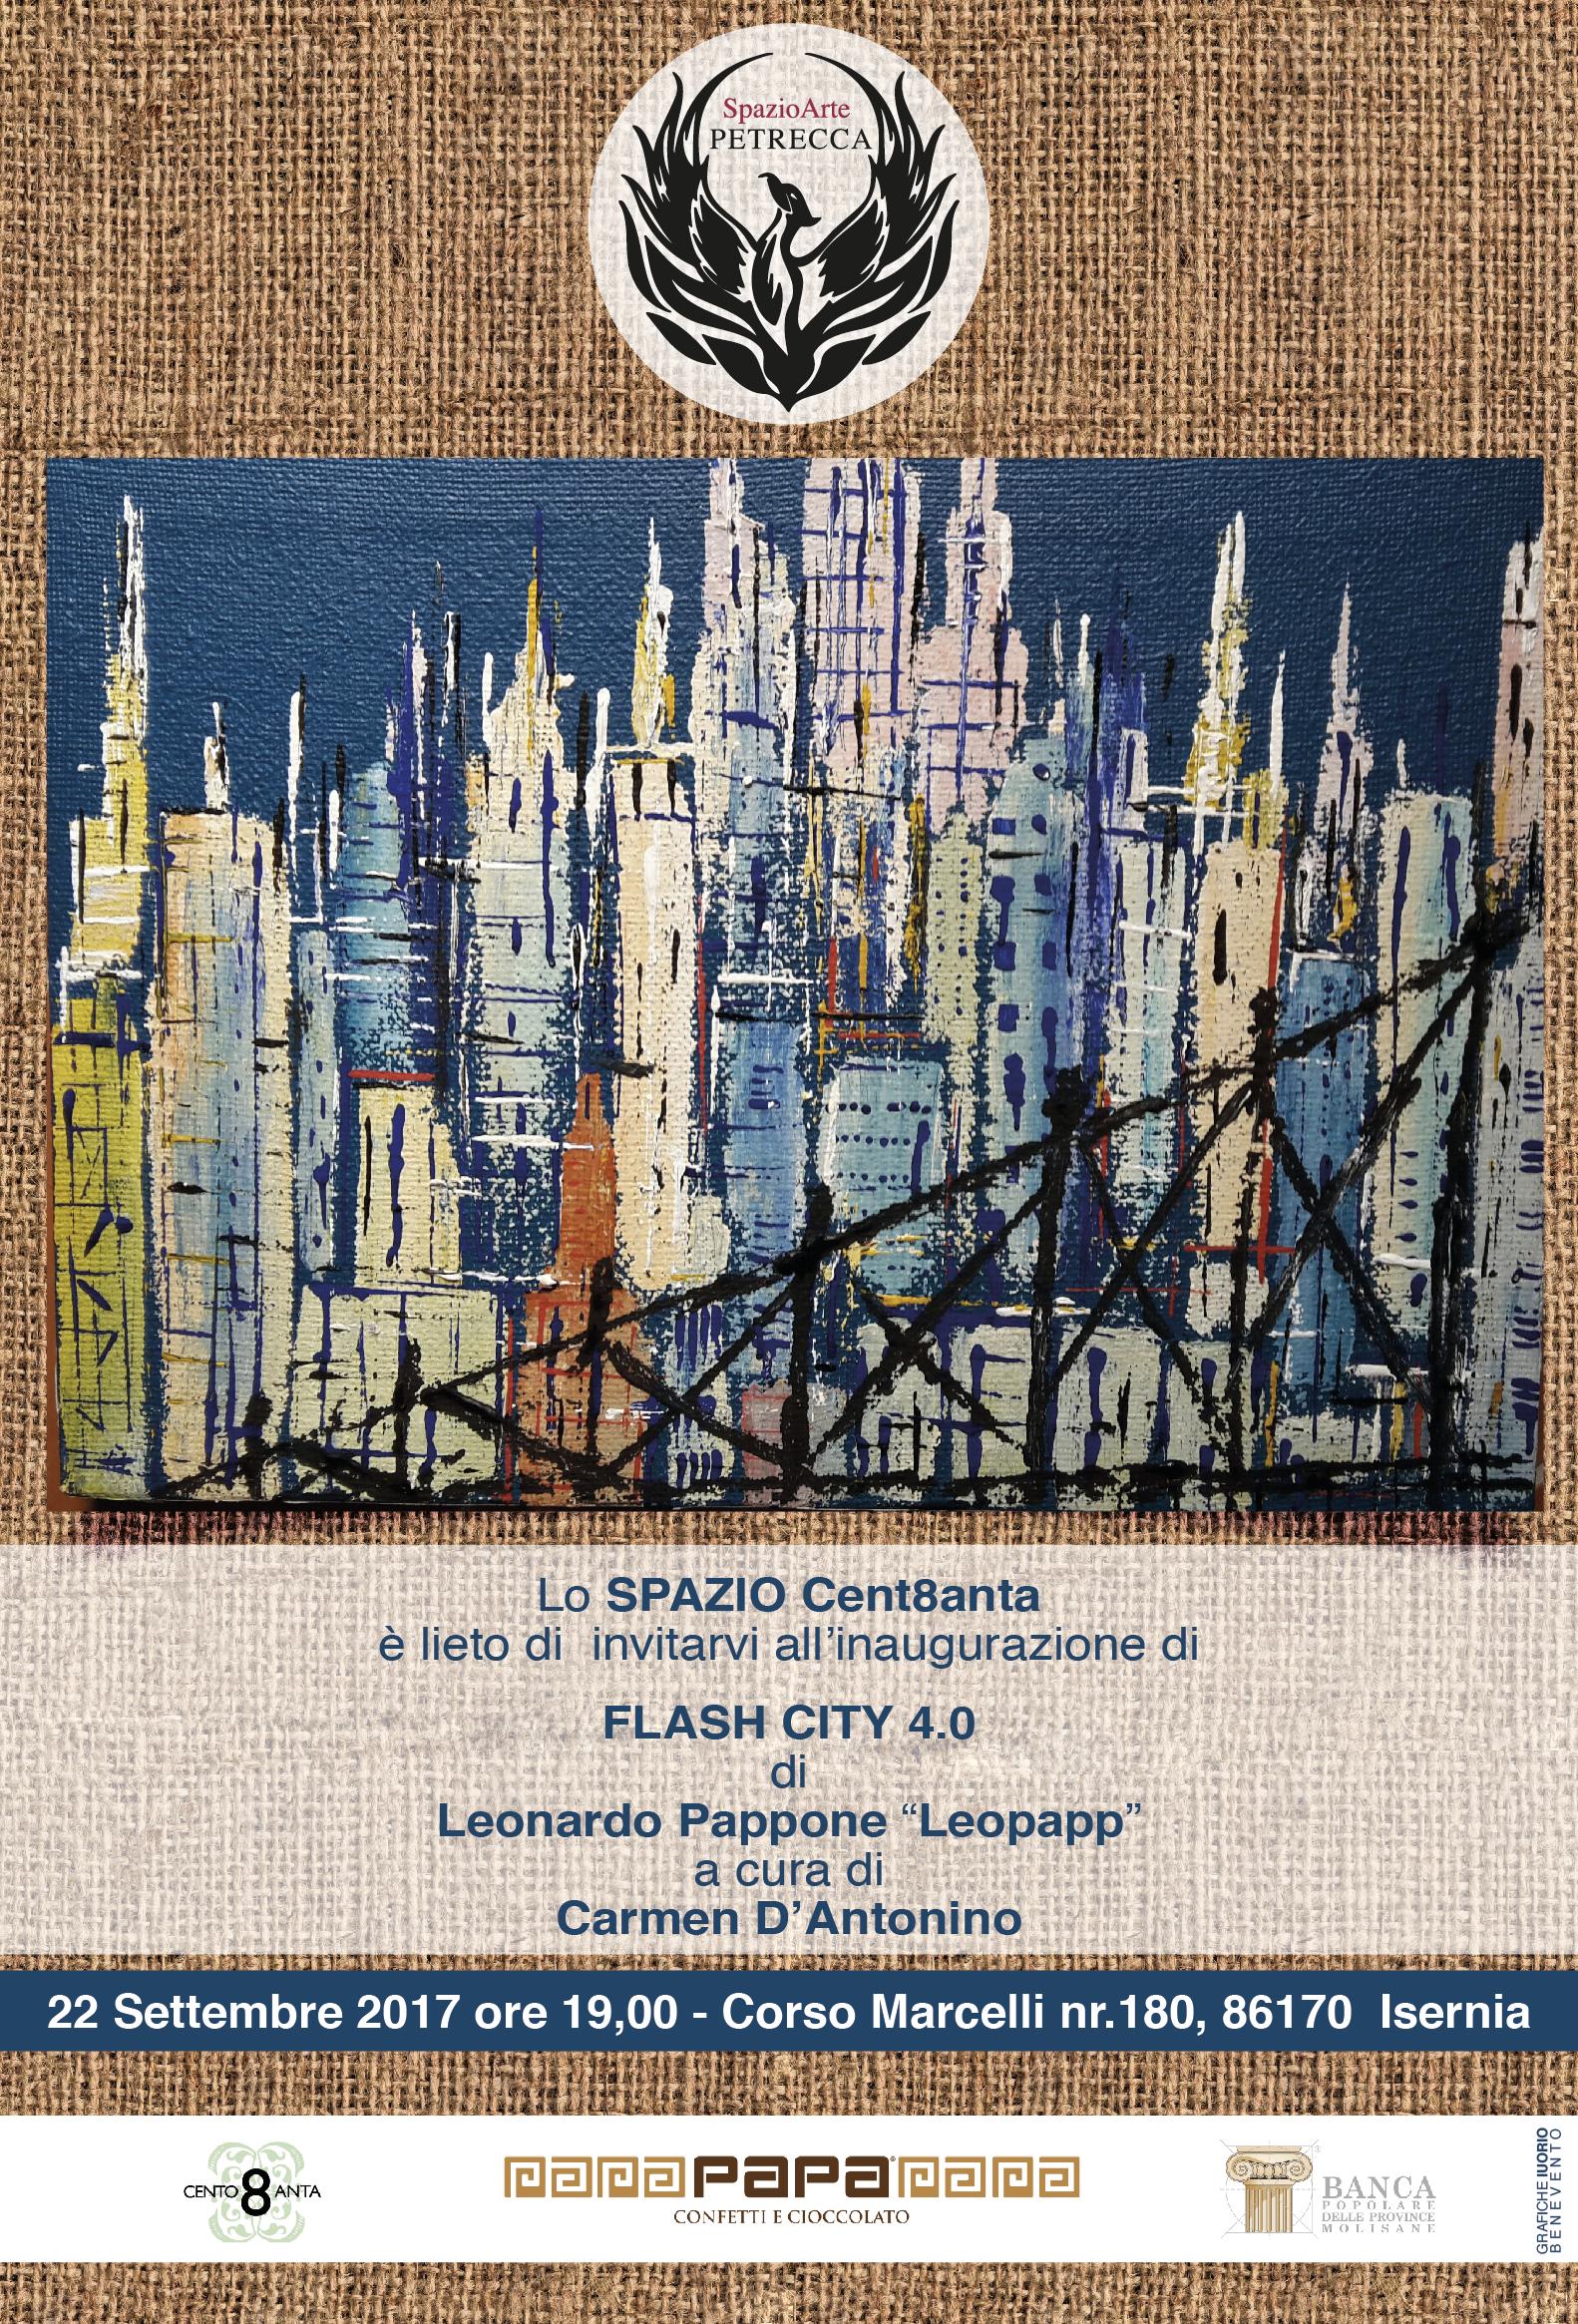 Mostra Personale : Flash City 4.0. U2013 Galleria Du0027arte Cent8anta U2013 Isernia.  Vernissage: Venerdì 22 Settembre 2017 Ore 19,00.